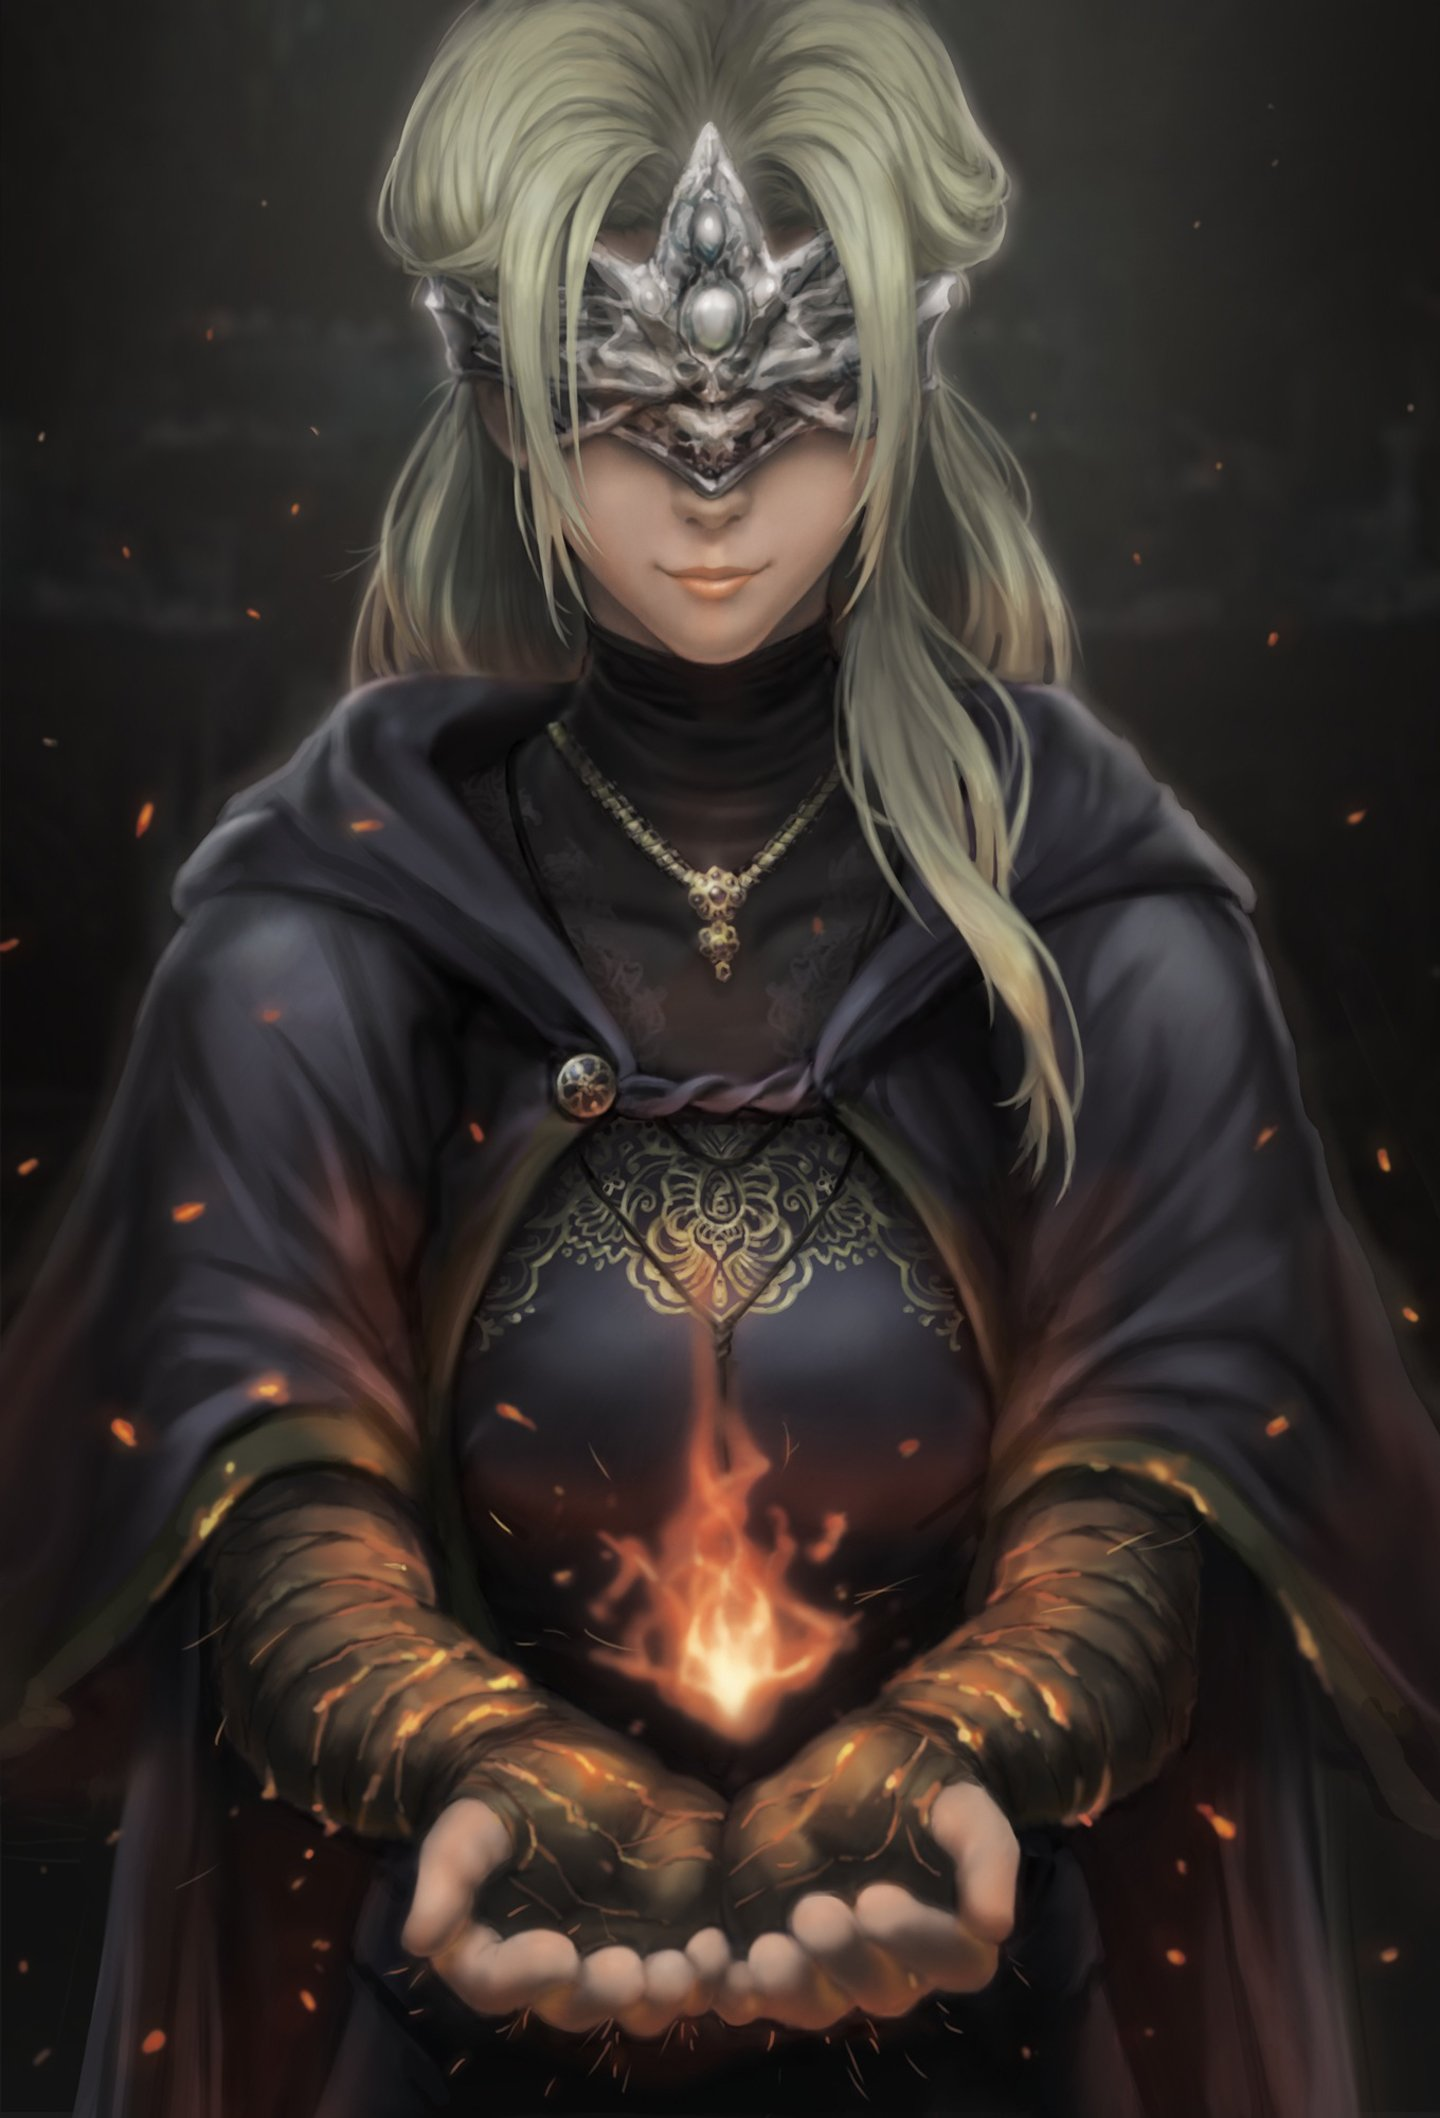 Bandages Dark Souls Dress Fire Keeper Marco Poon Wallpaper